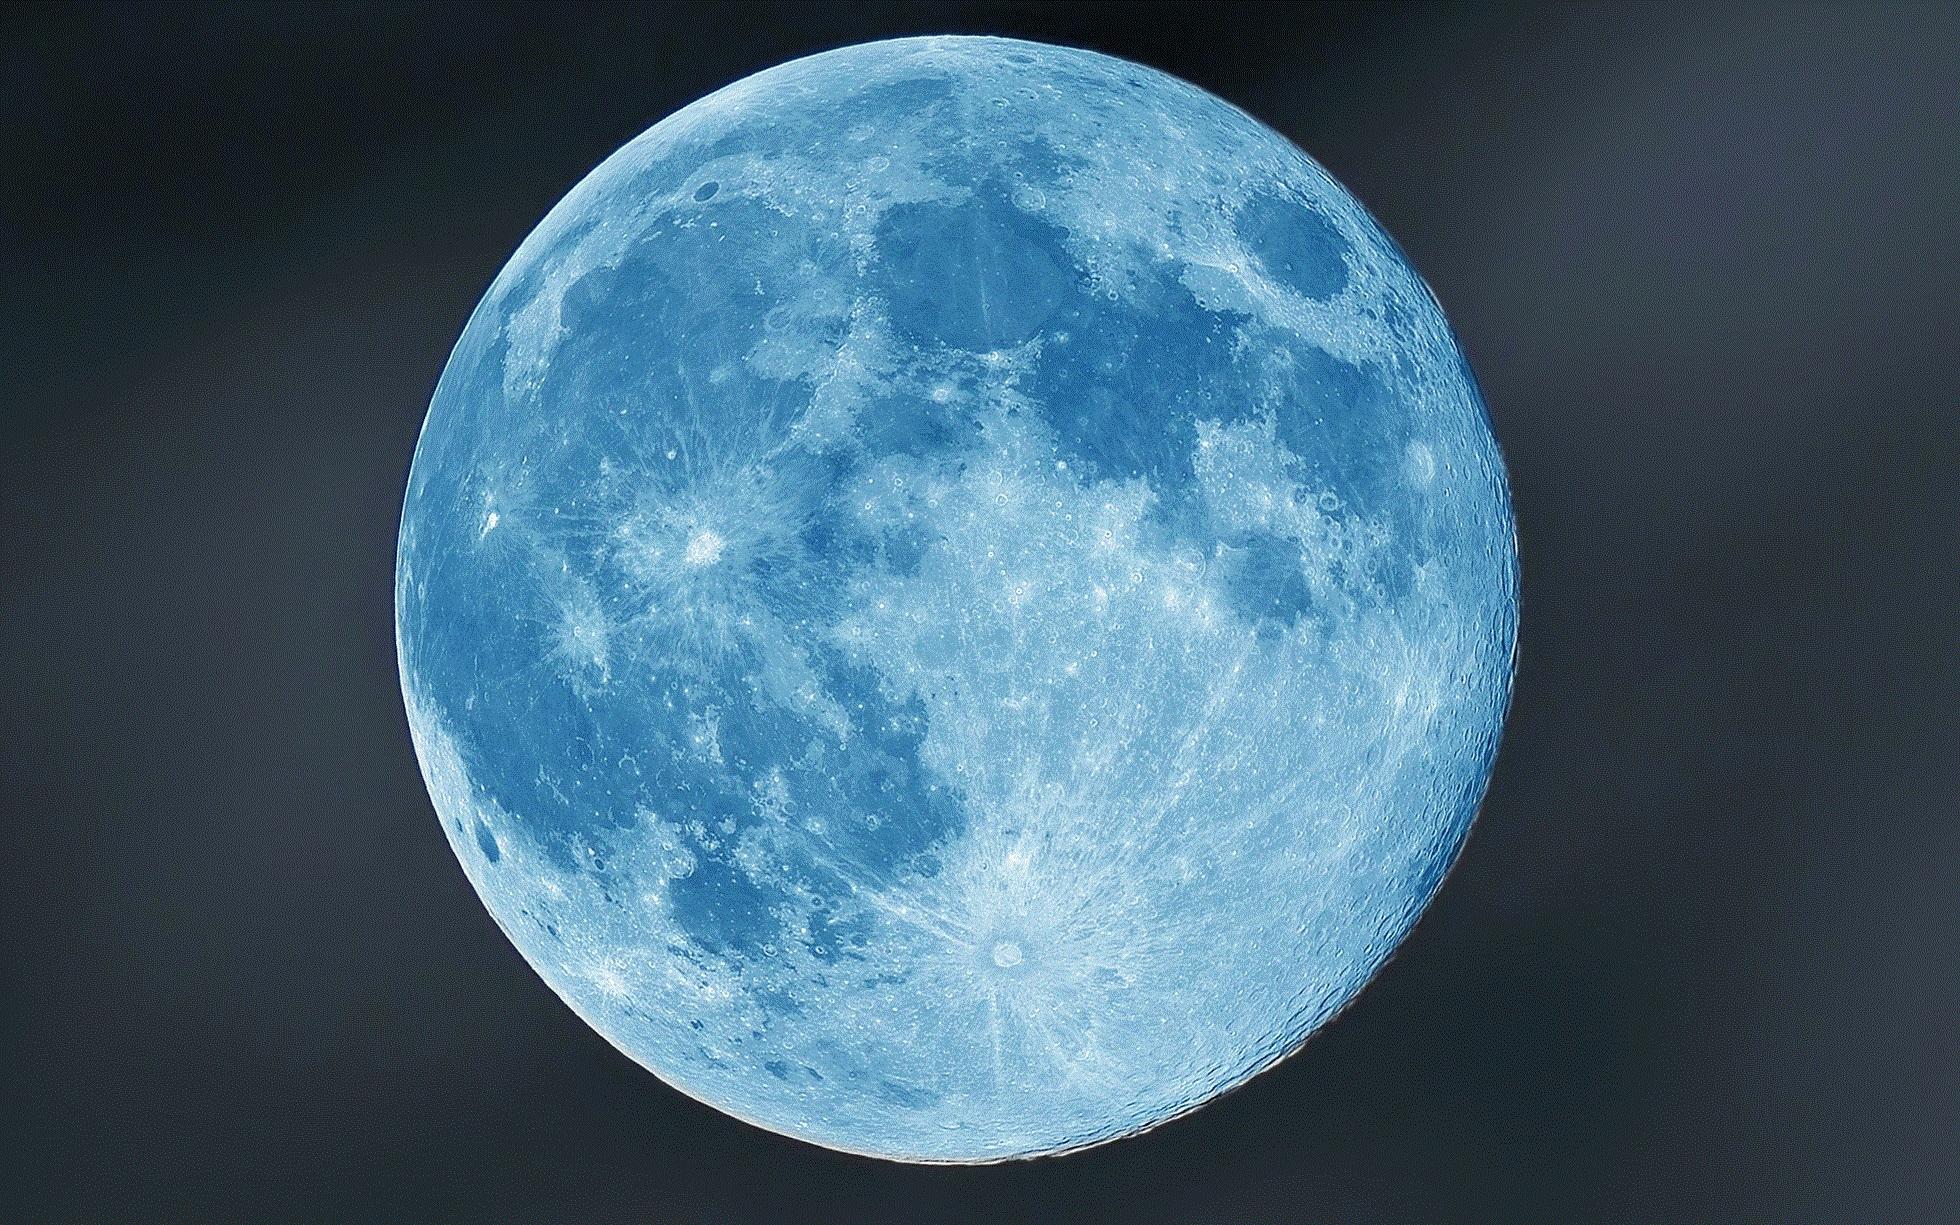 Blue moon image